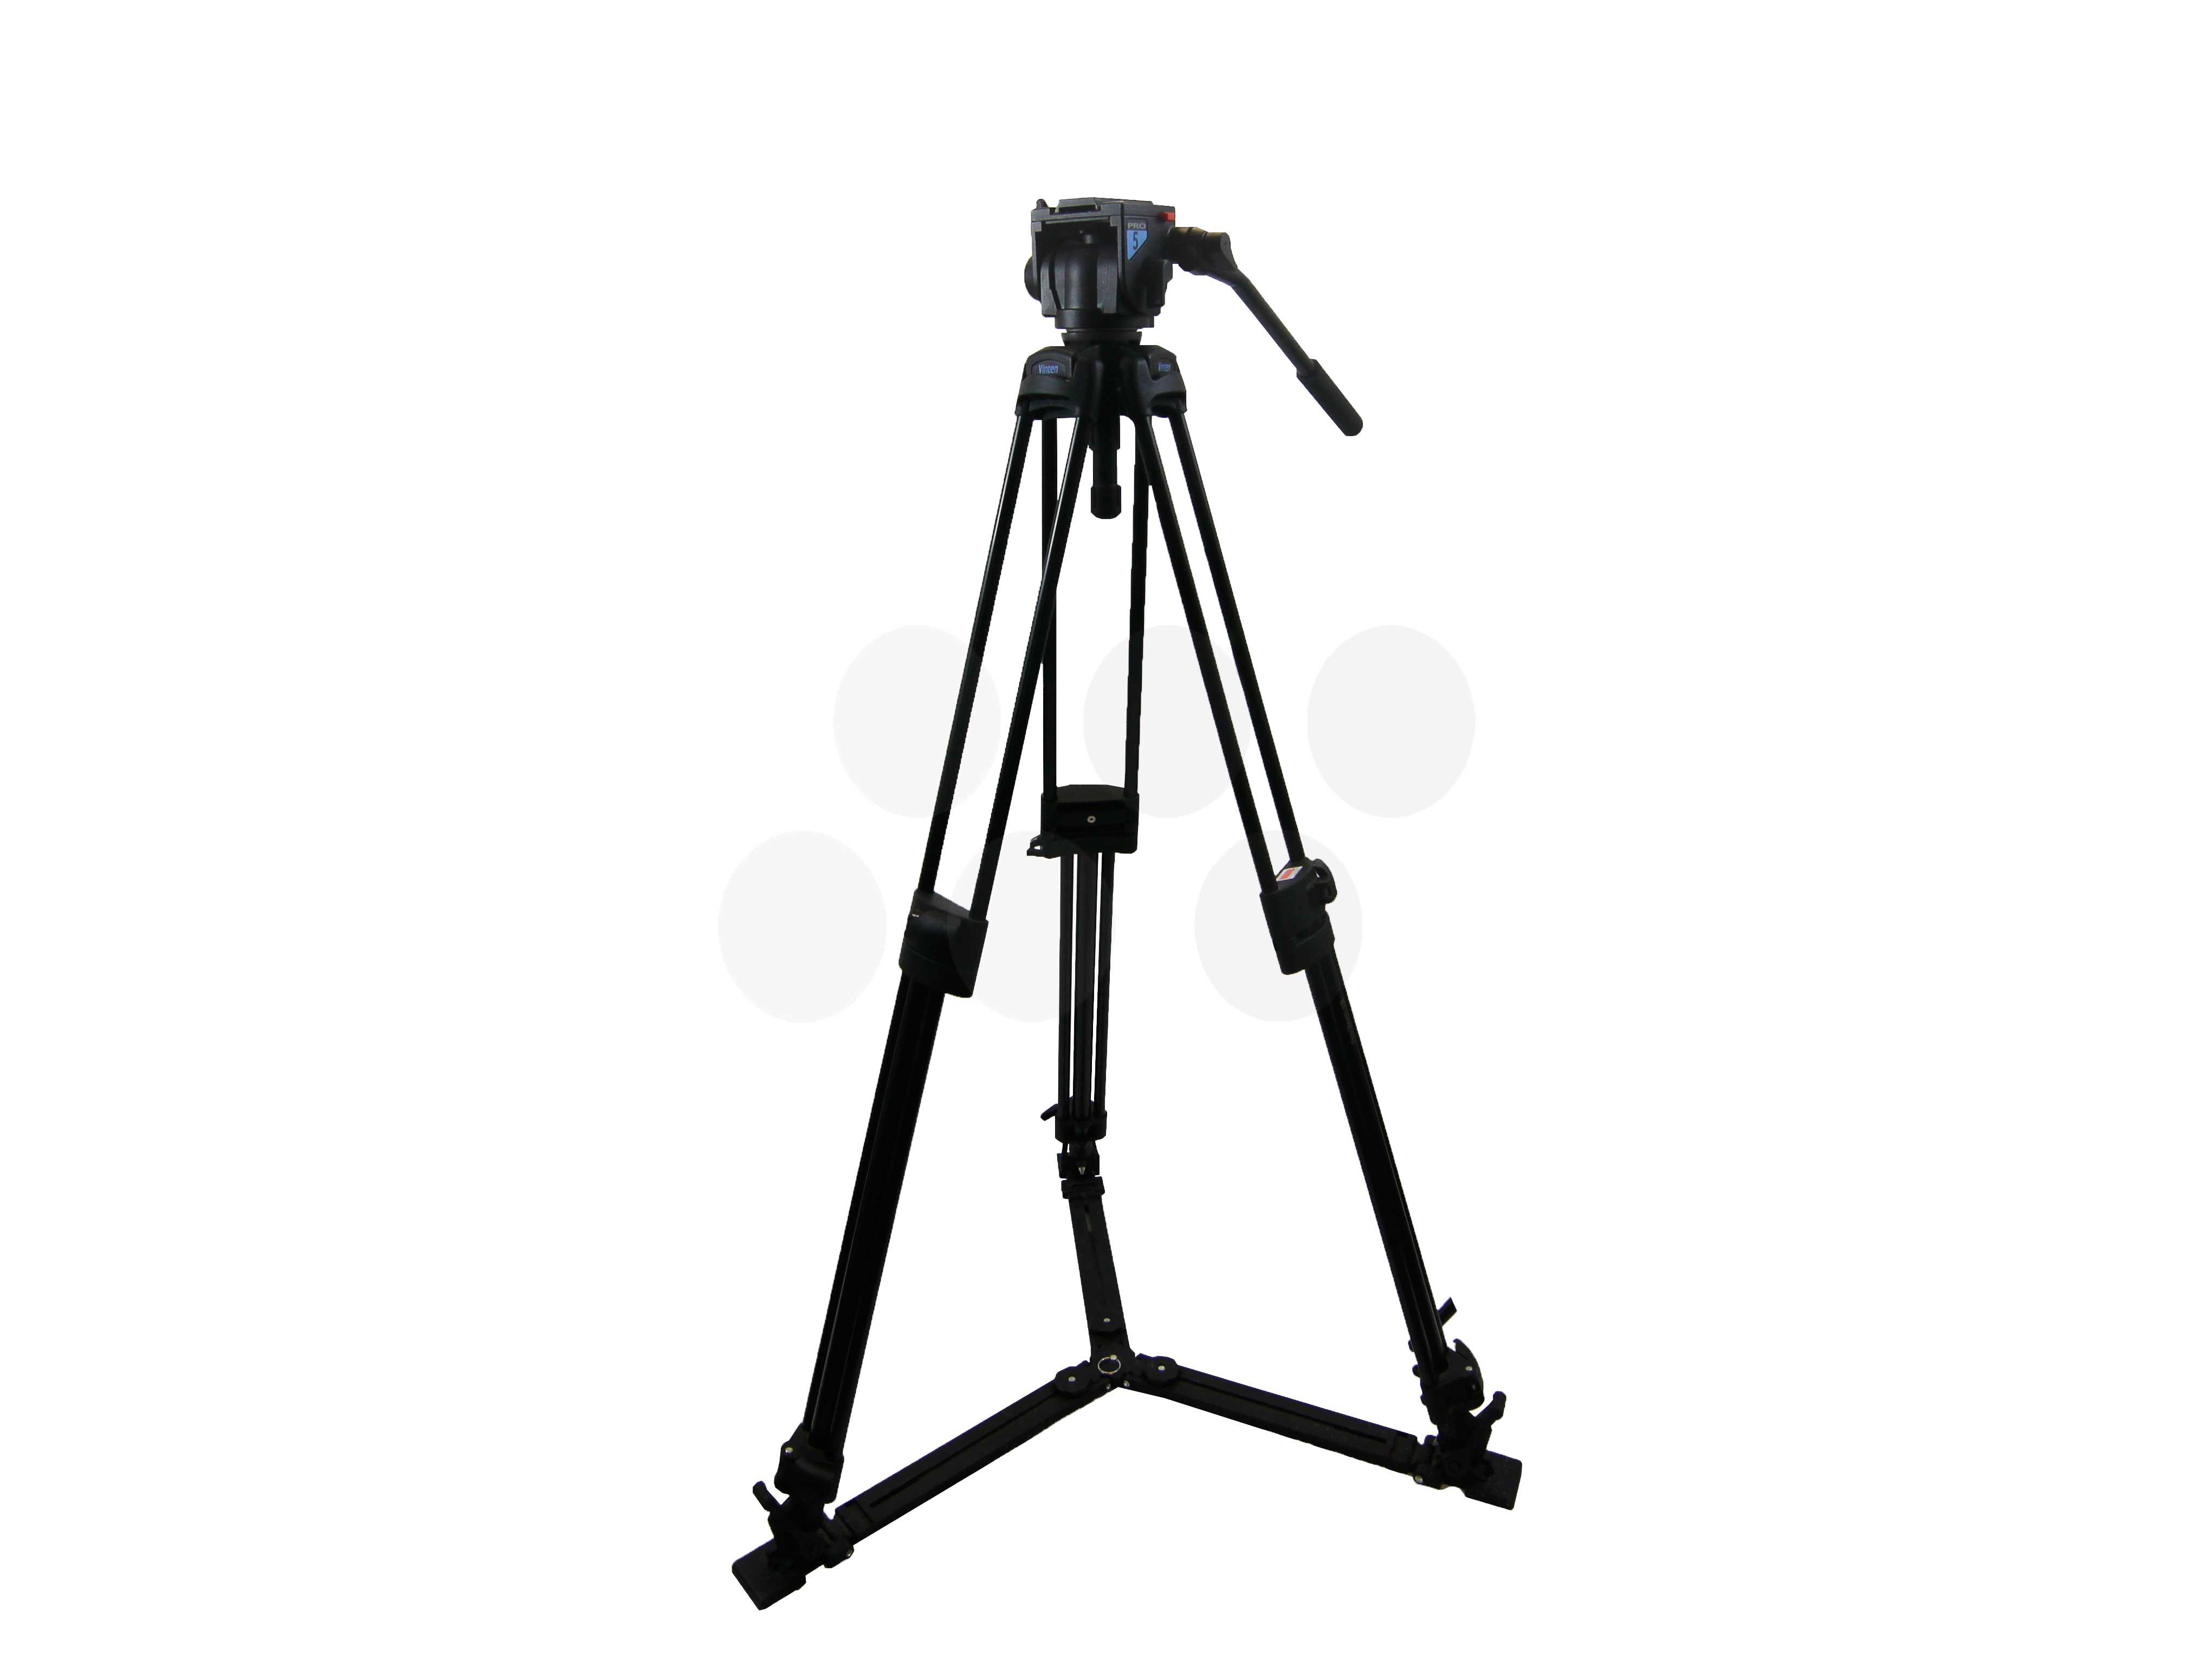 Vinten Vision Pro 5 Camera Tripod